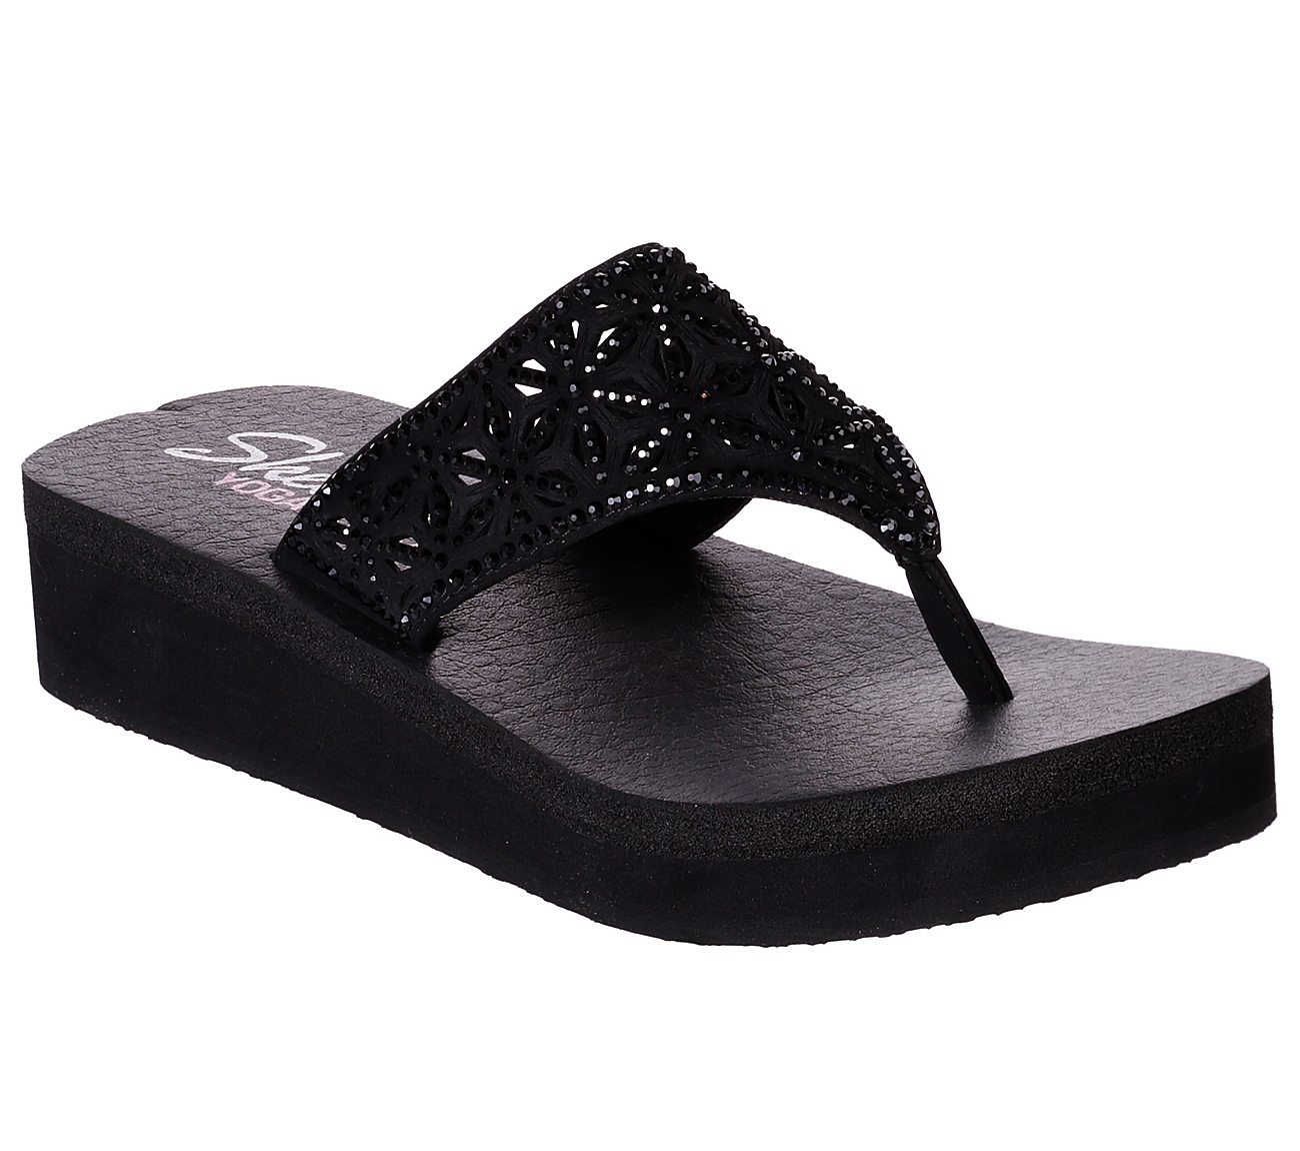 Buy SKECHERS Vinyasa Glass Star Cali Shoes 4rBIu